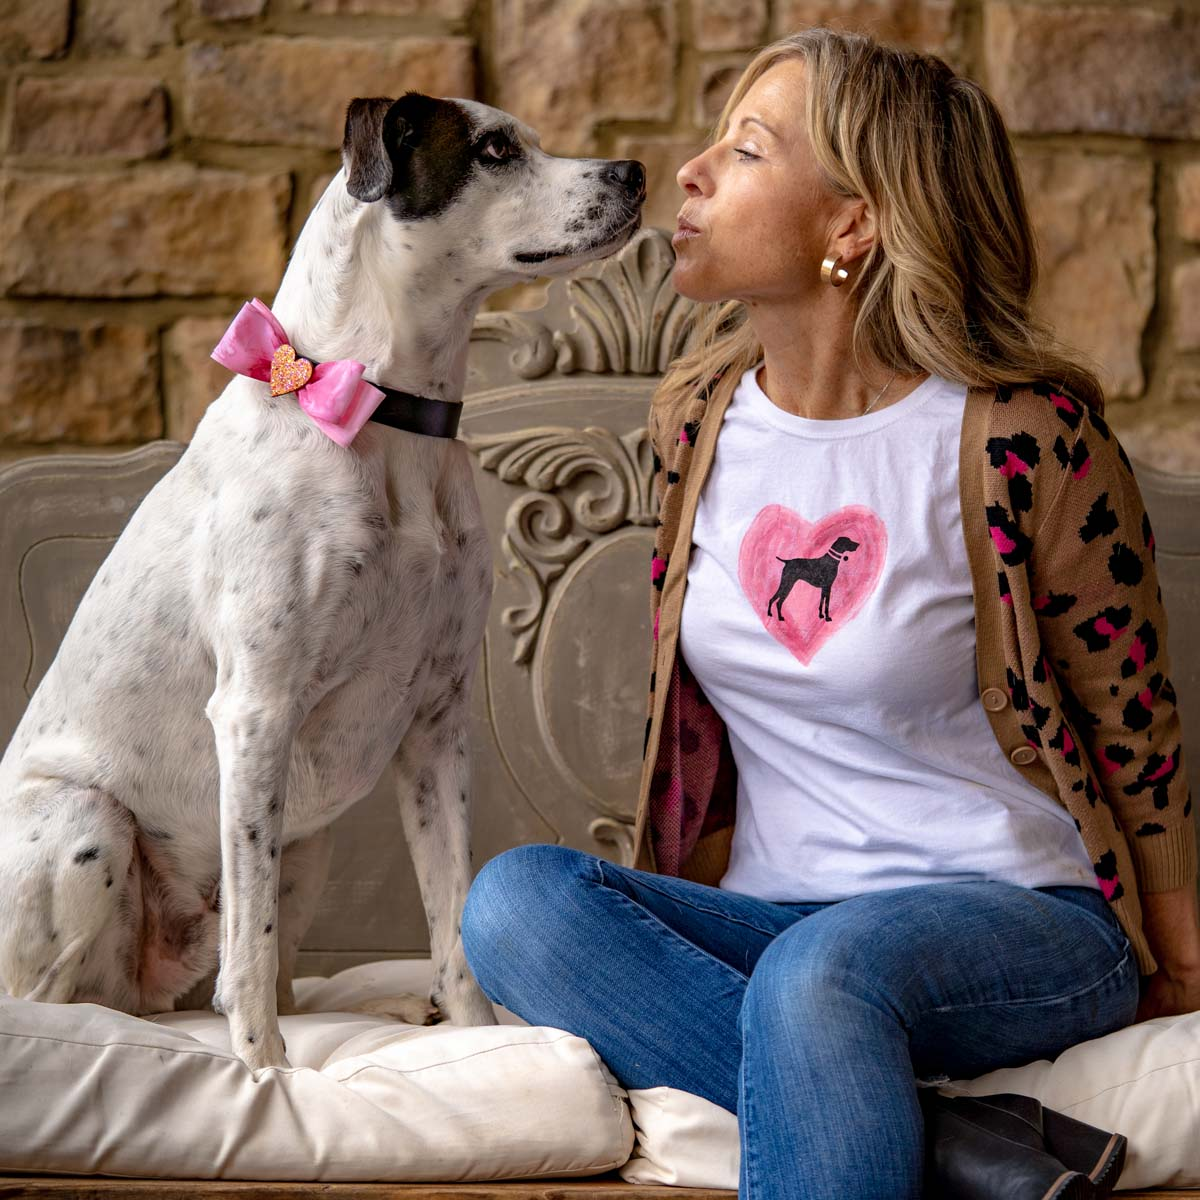 Pet Lovers' Valentine's Day Gift - Dog Mom Tee & Doggie Bowtie